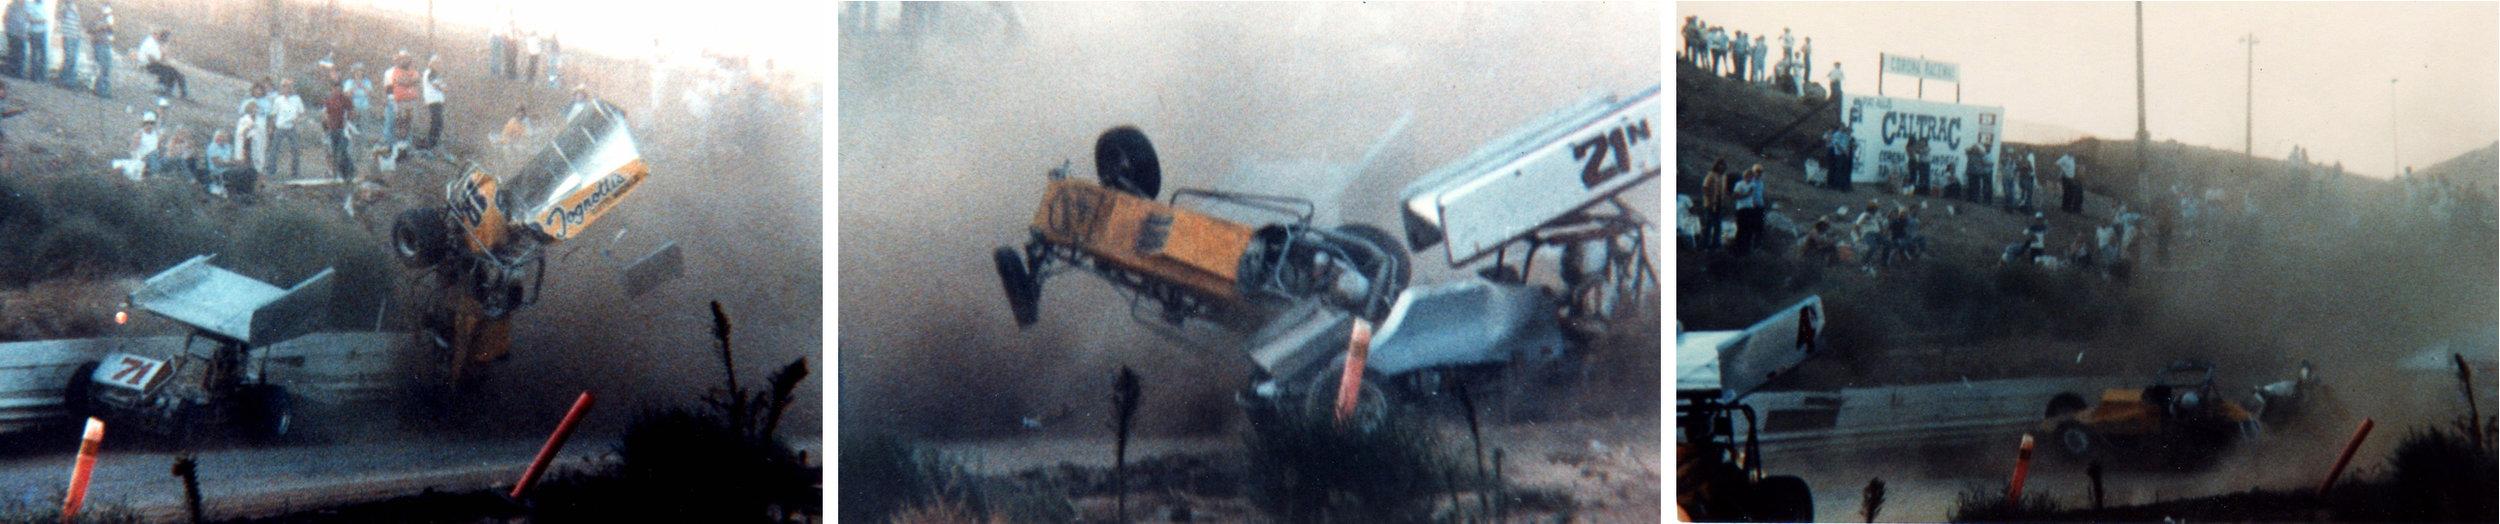 Johnny's sprint car crashes at Corona Raceway, November, 3, 1980. (Archive photos)